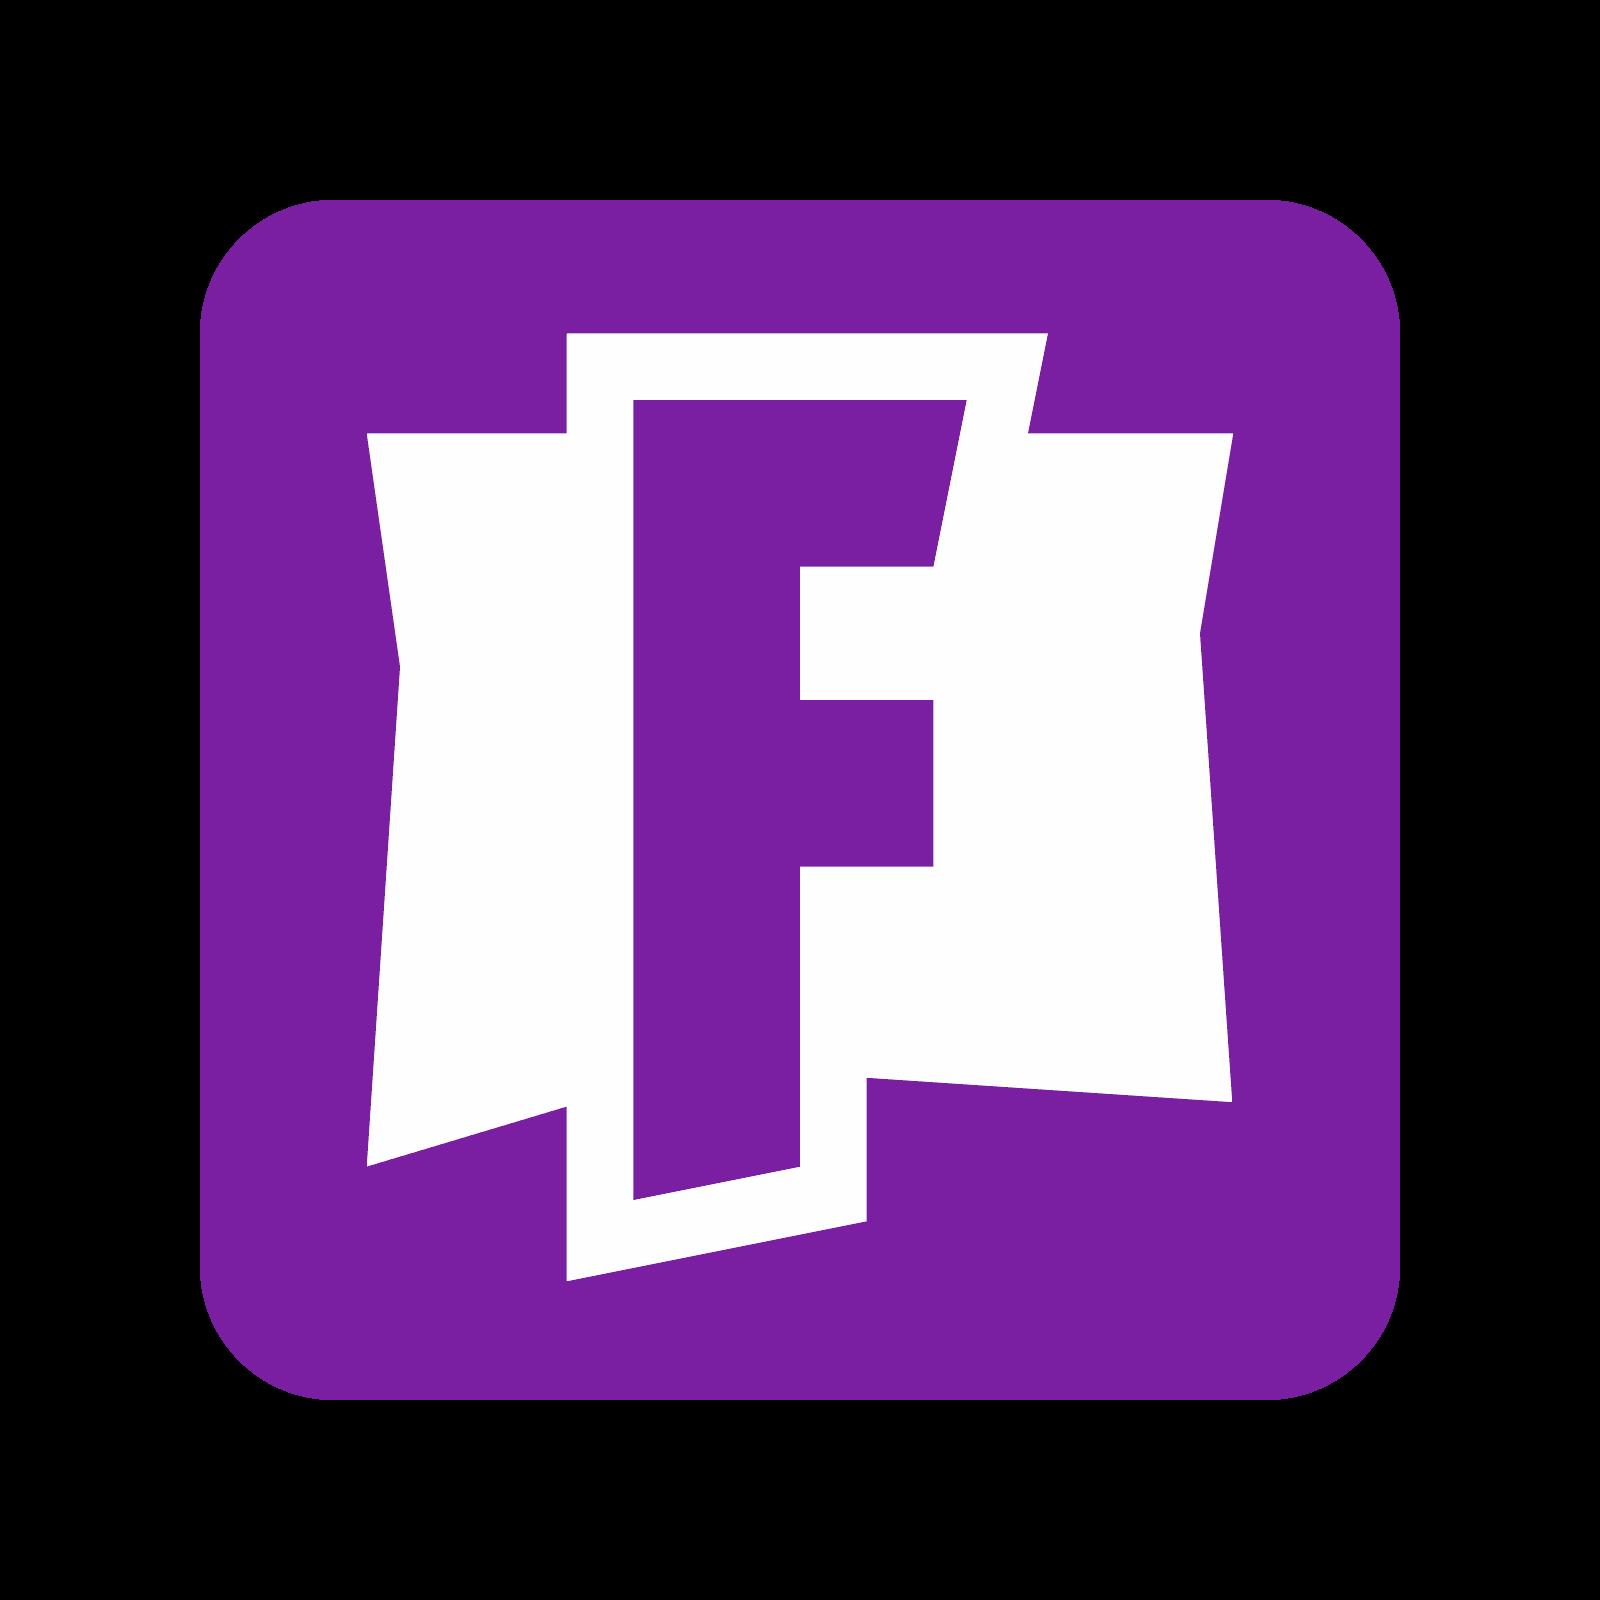 Fortnite Logo Transparent